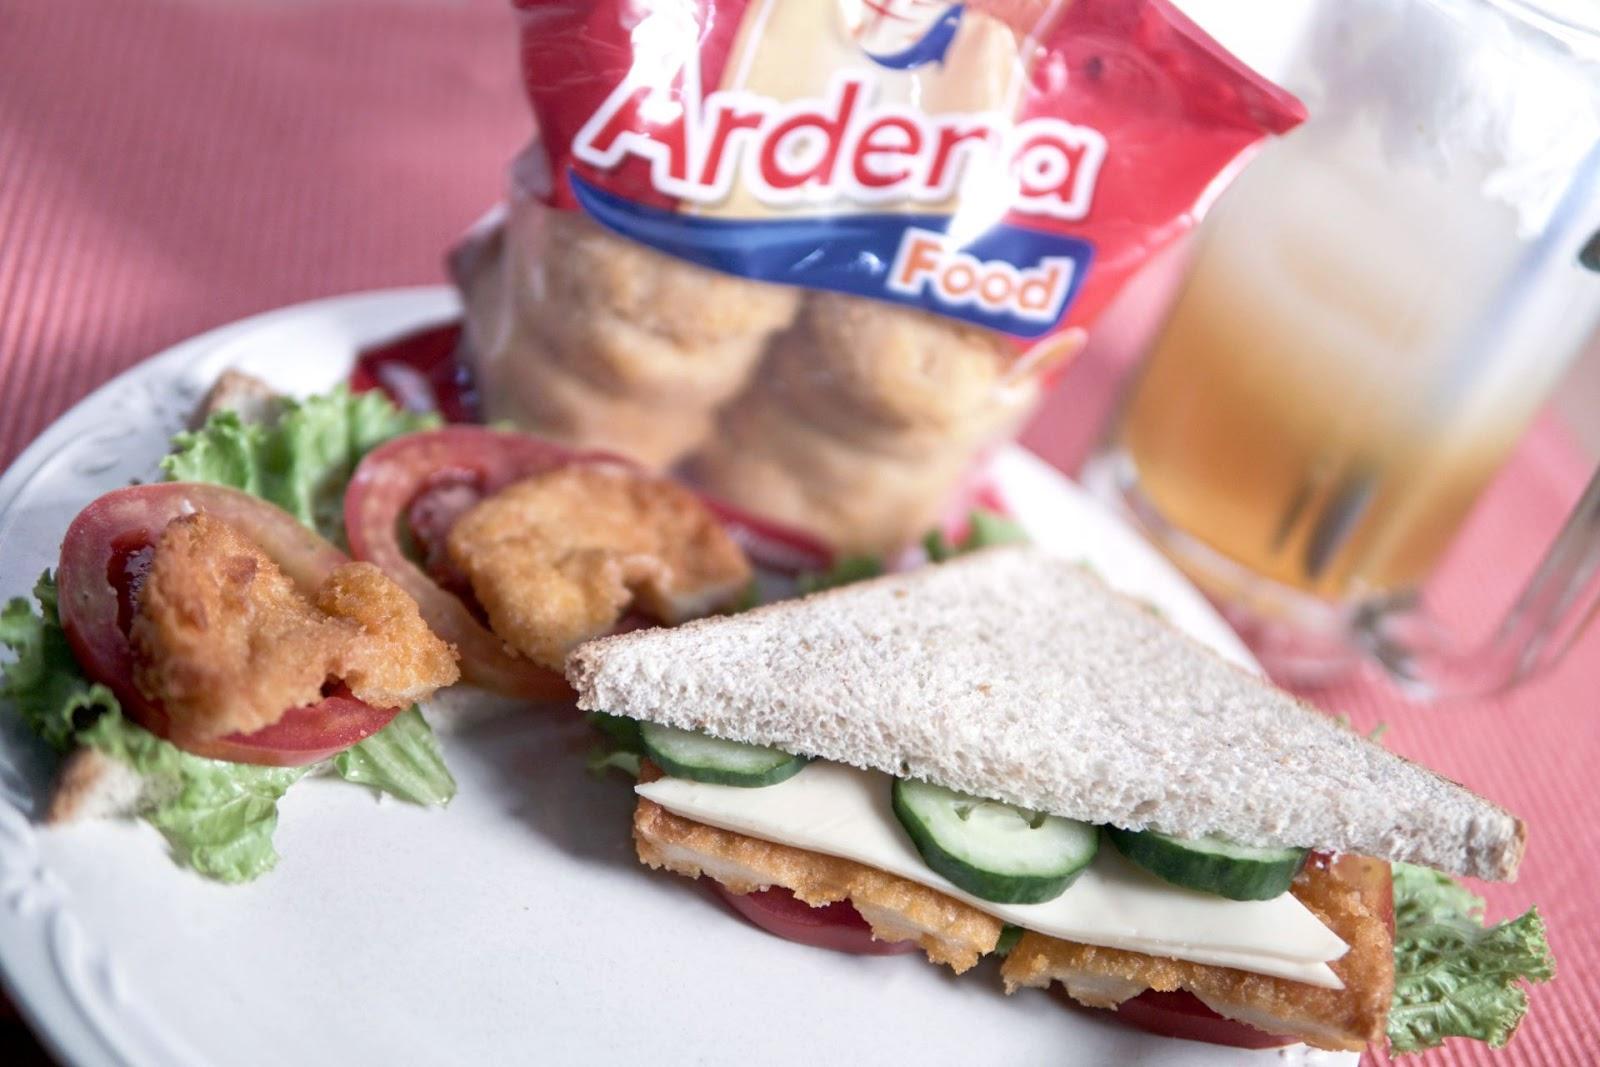 Produsen Frozen Food Terenak Terpercaya Ardena